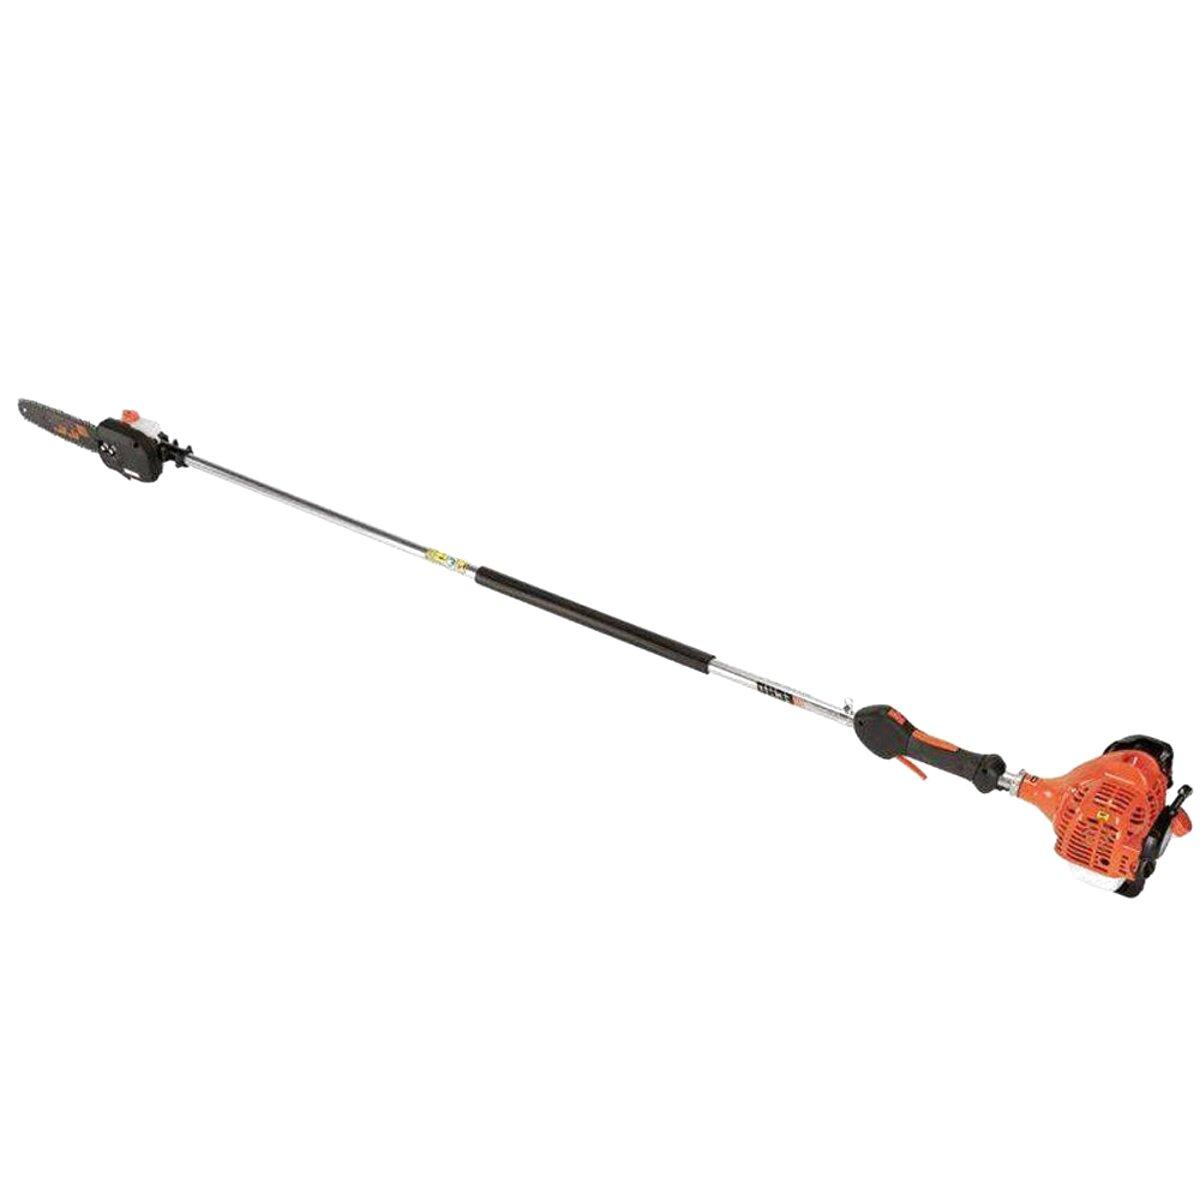 gas pole saw for sale